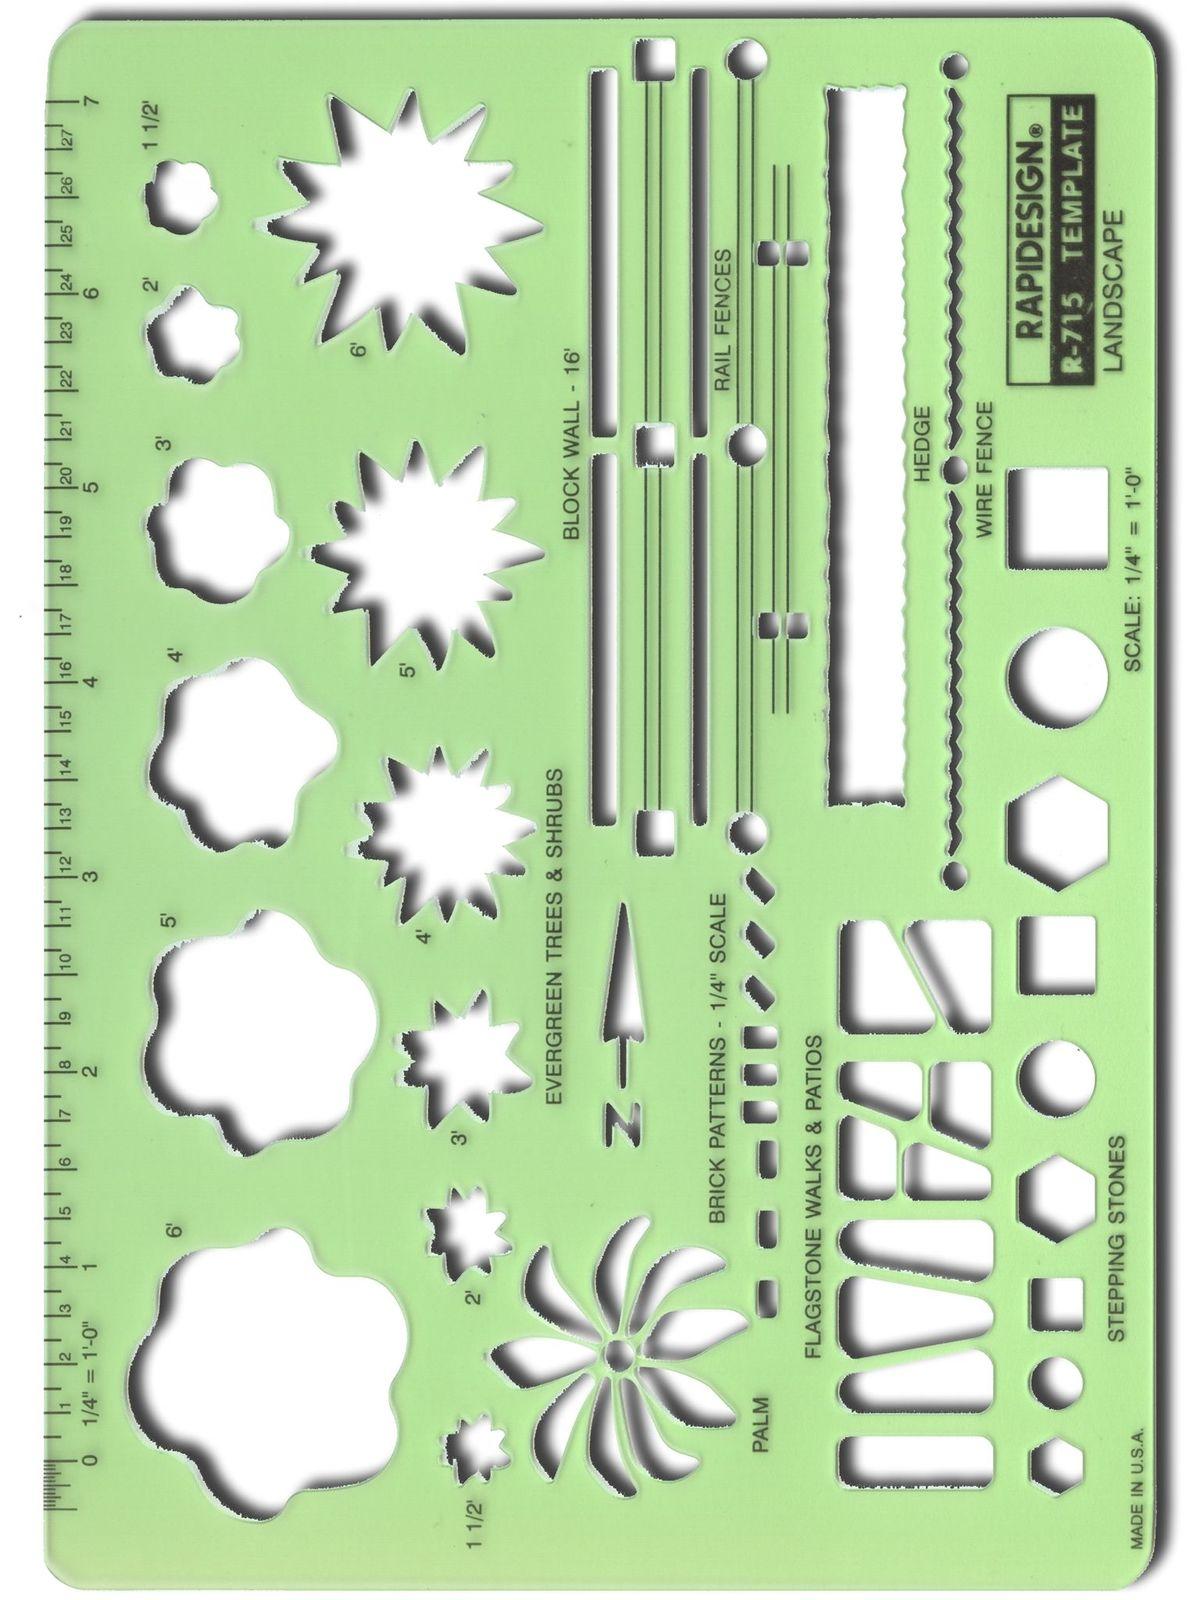 rapidesign landscape drafting and design template misterart com